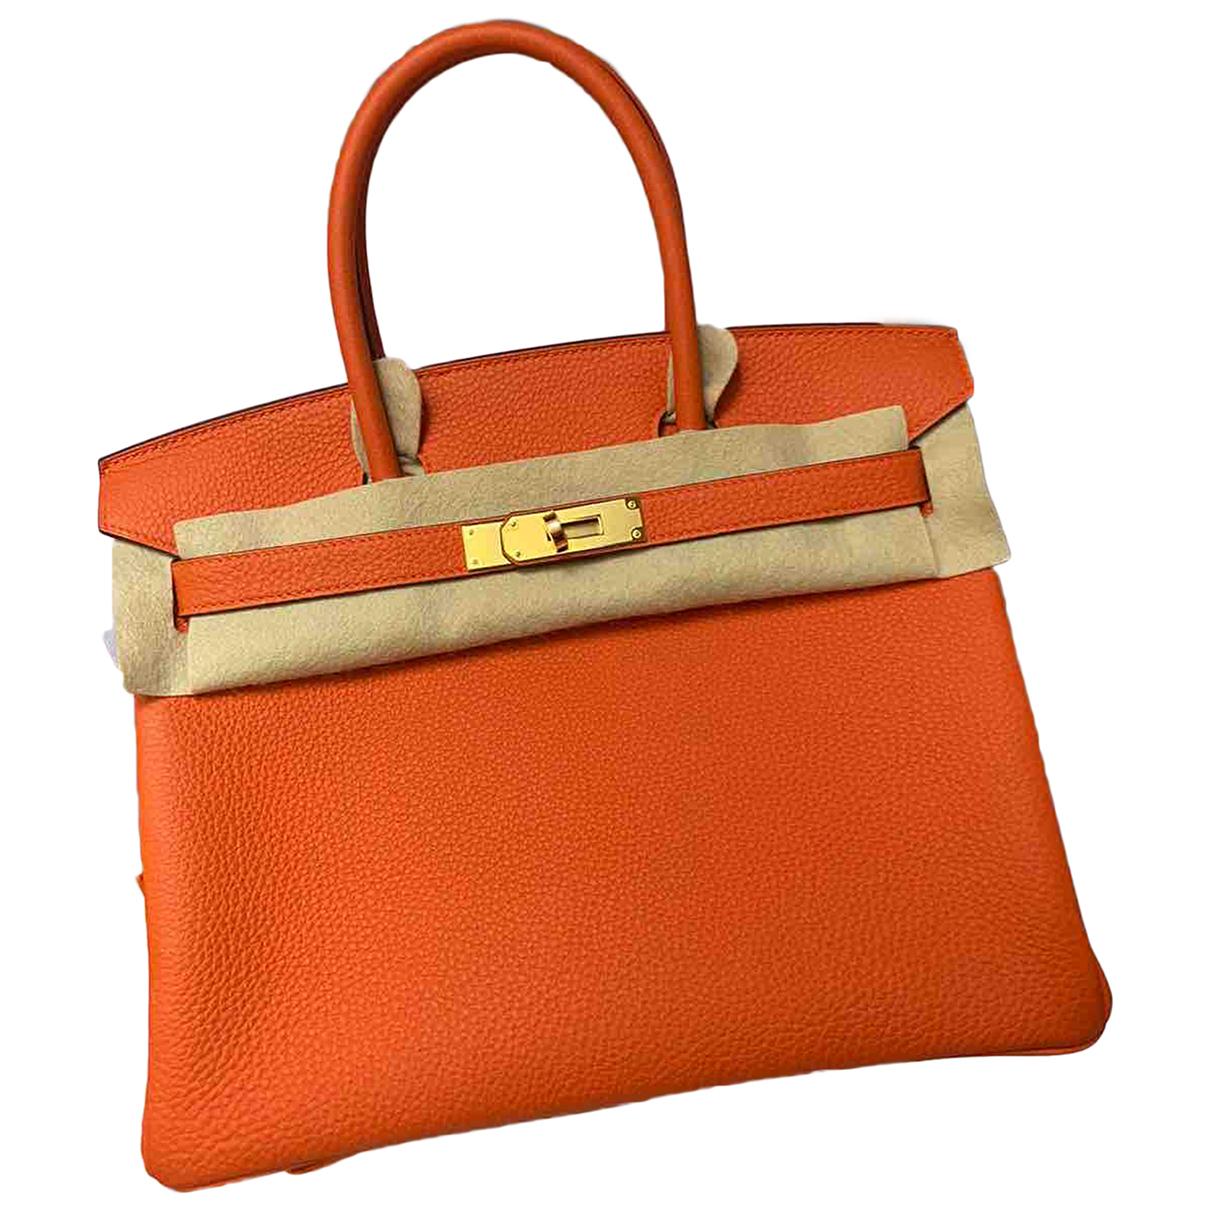 Hermès Birkin 30 Orange Leather handbag for Women \N